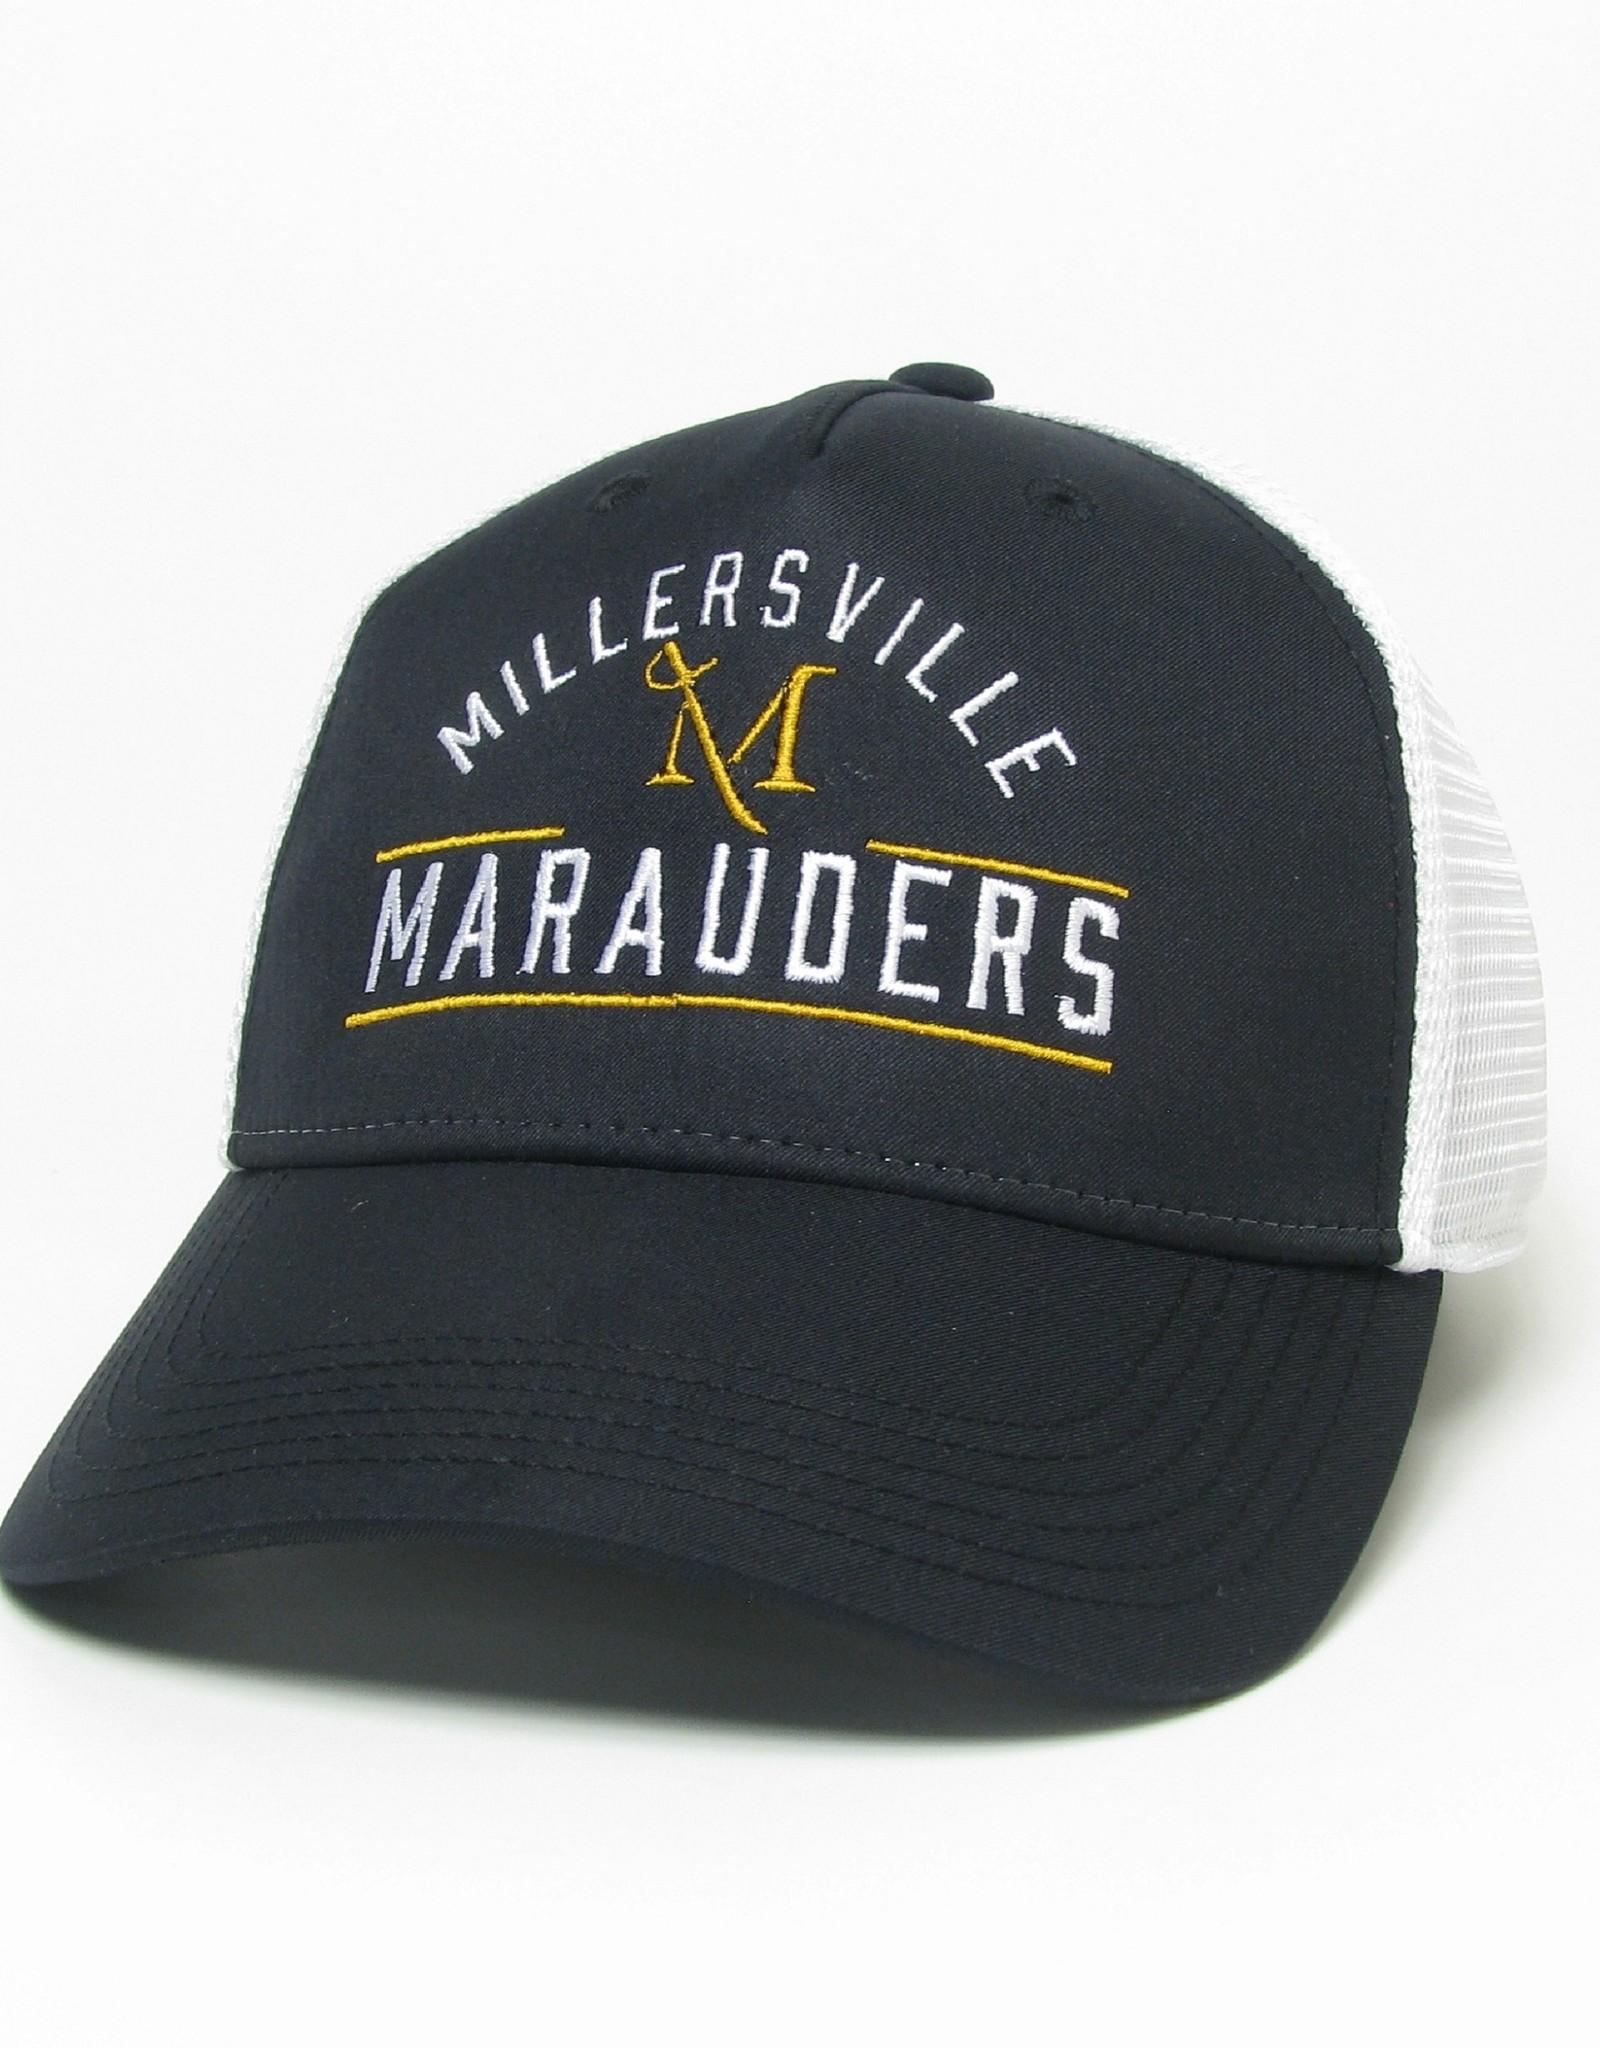 League Cool Fit Structured Adjustable Cap